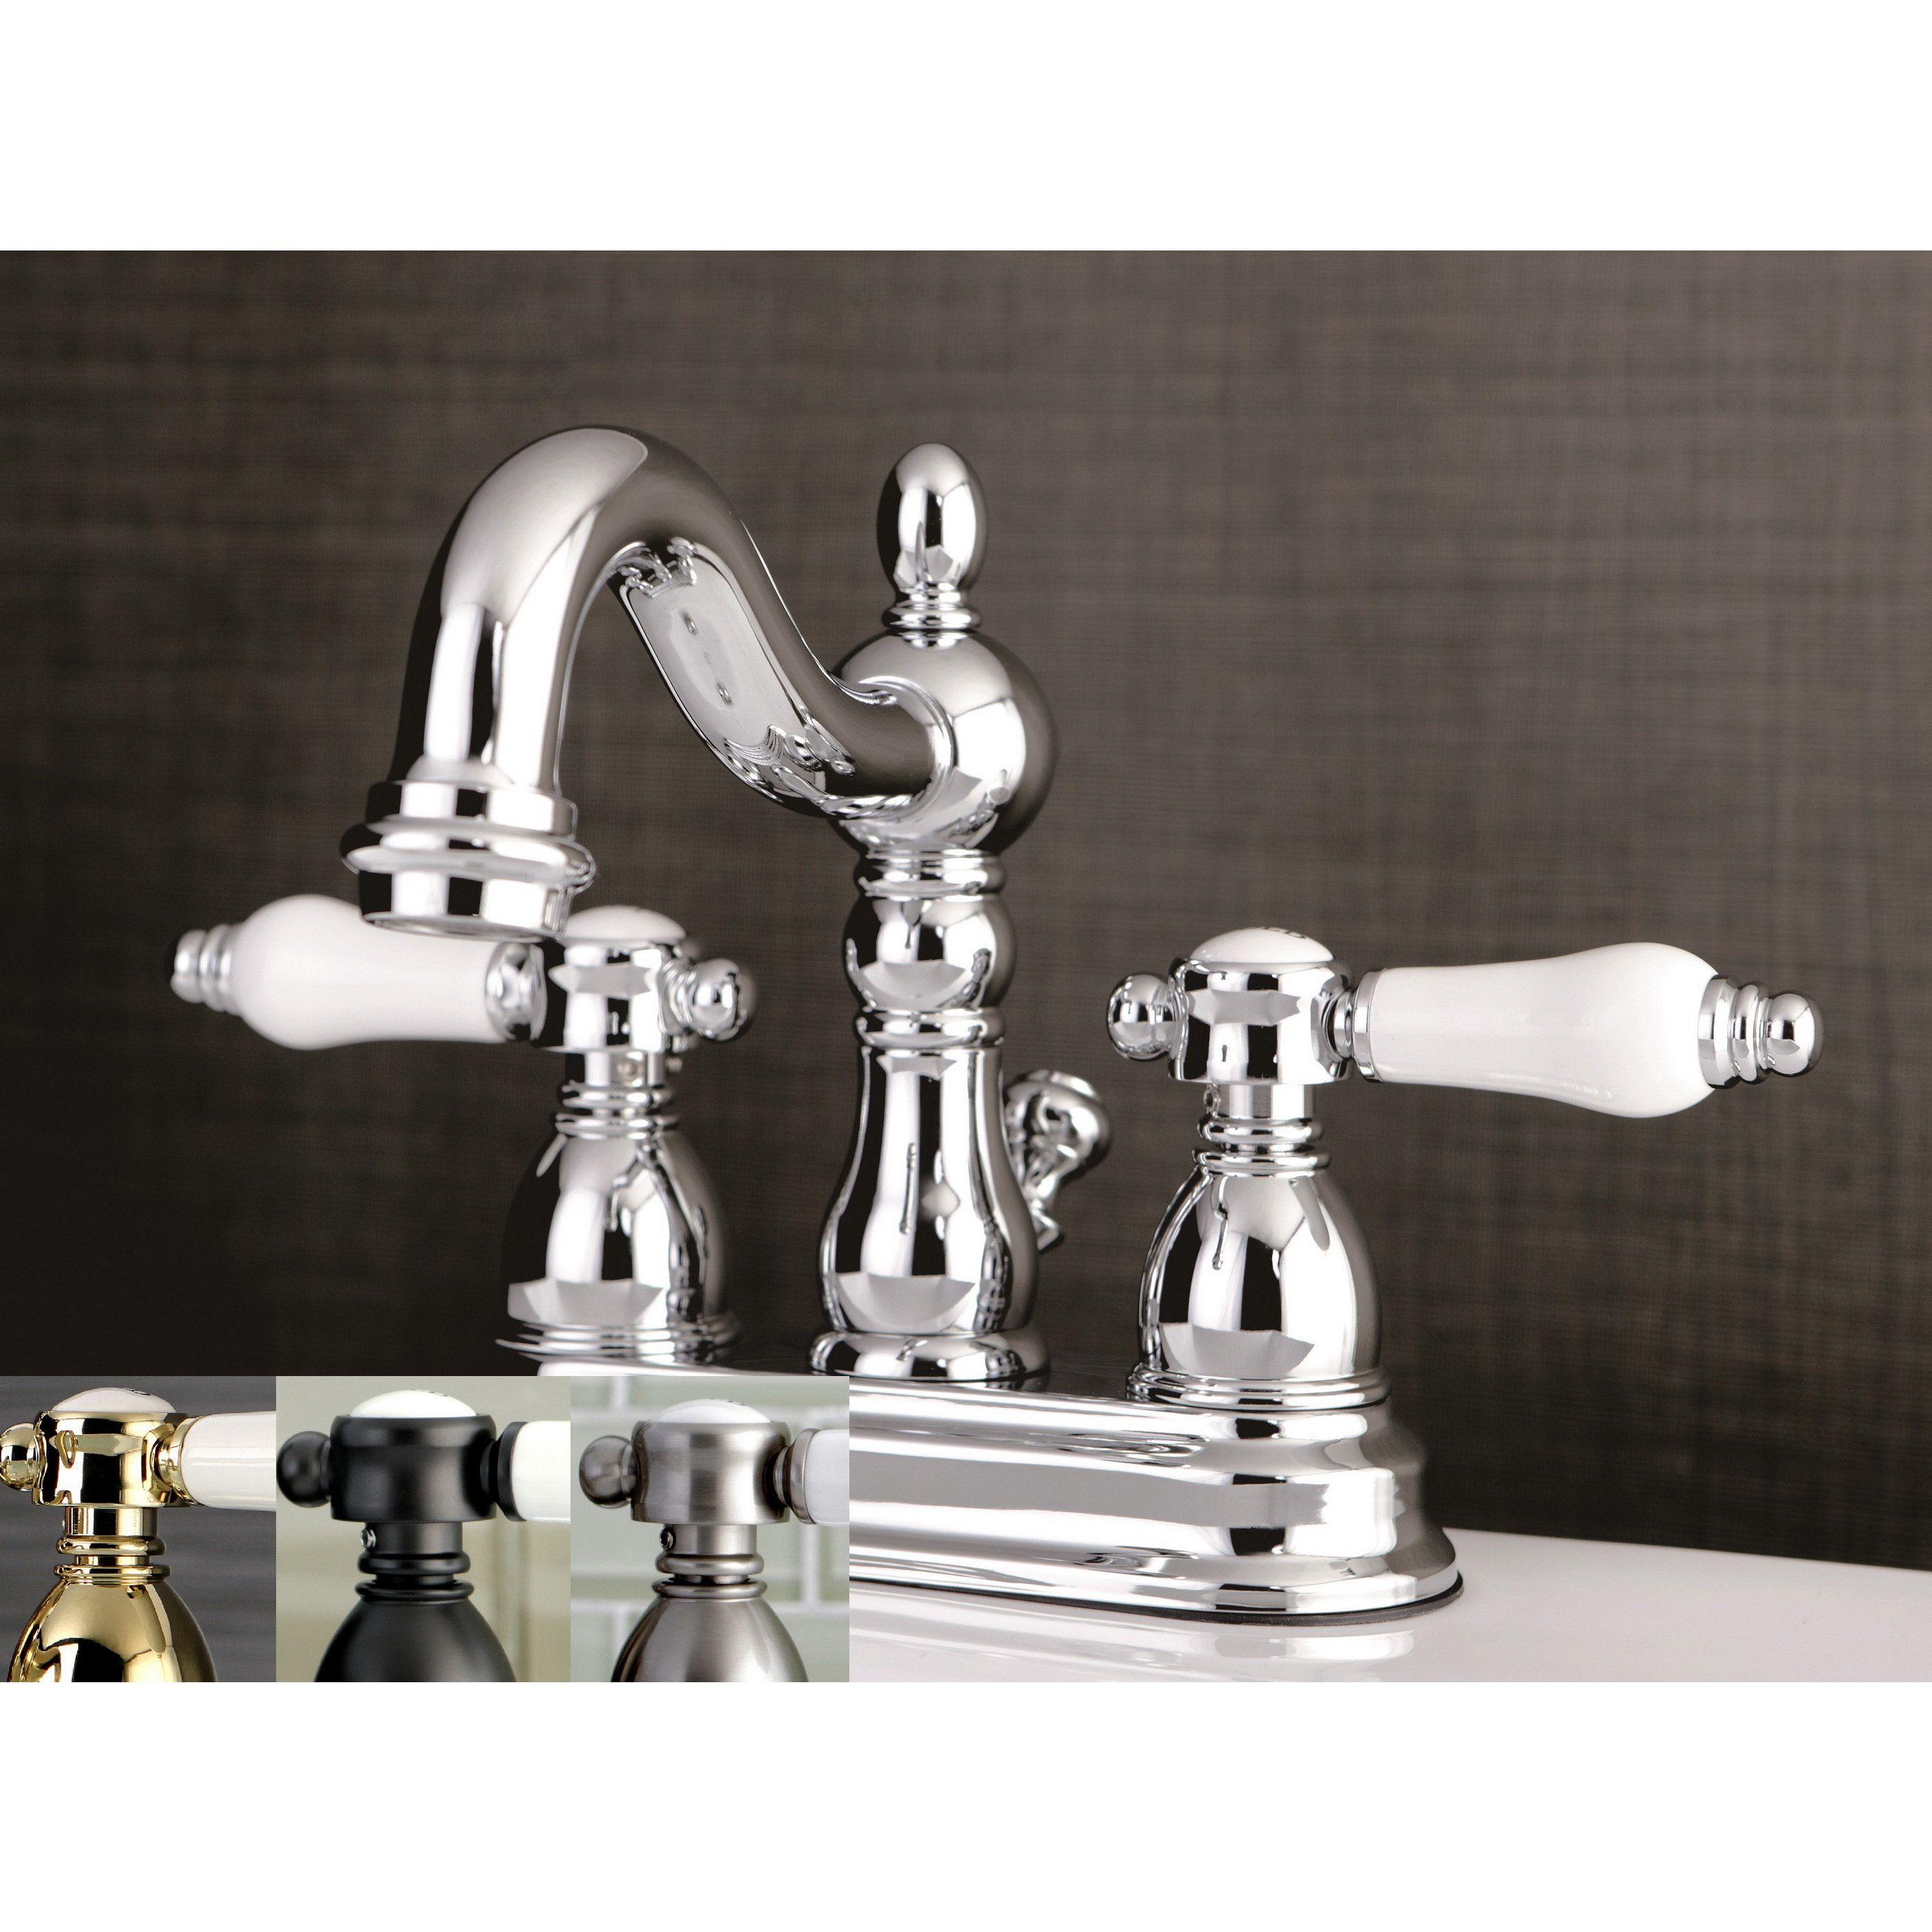 Victorian Porcelain Handles Bathroom Faucet Satin Nickel Grey Entrancing Porcelain Handle Bathroom Faucet Decorating Design